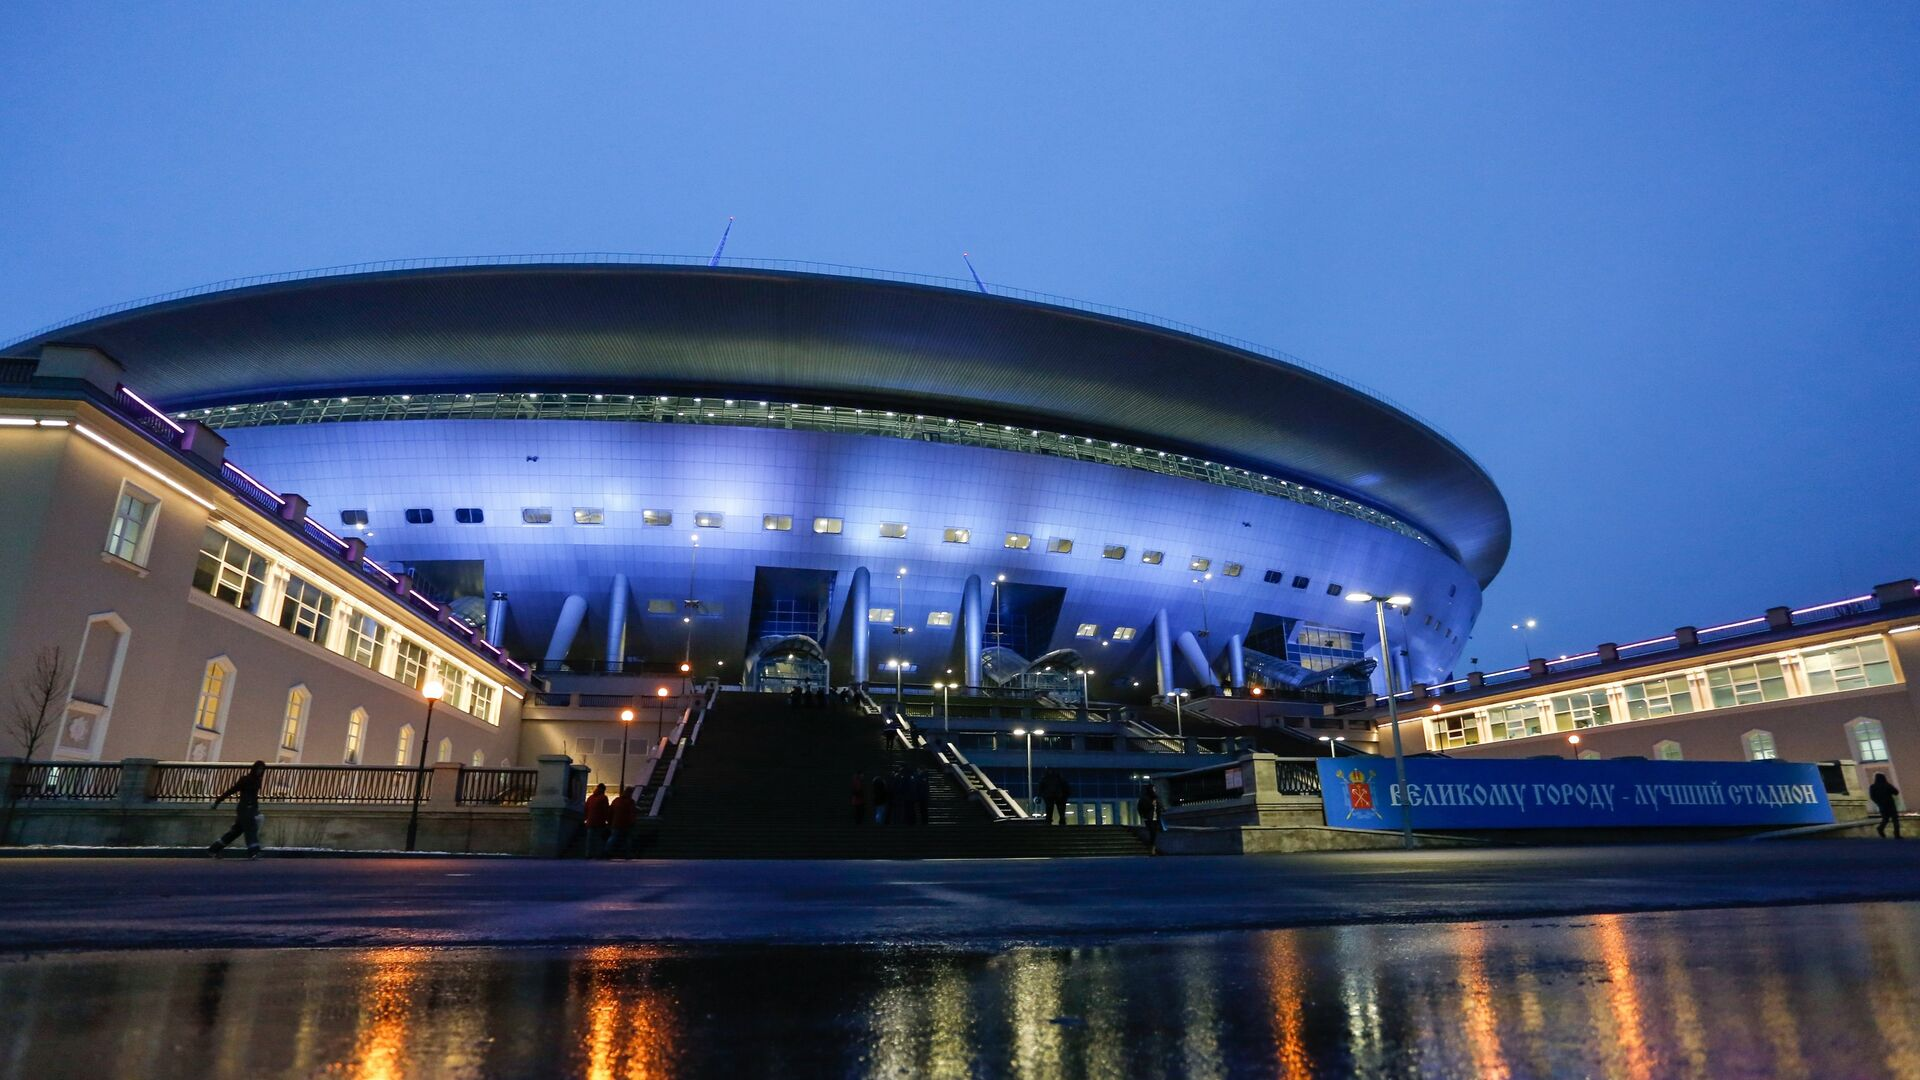 Стадион Зенит-Арена в Санкт-Петербурге - РИА Новости, 1920, 11.02.2021